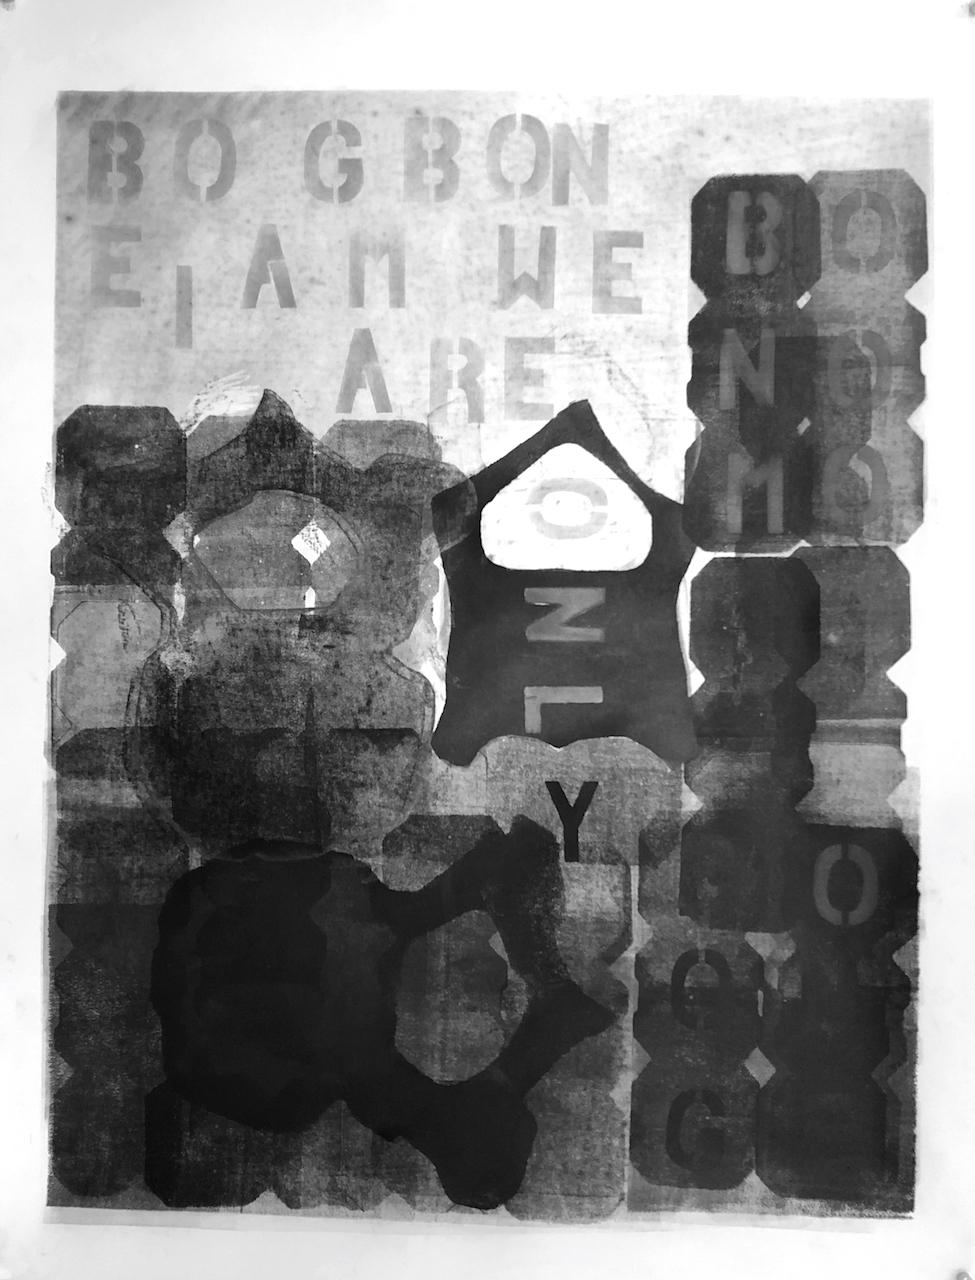 "BOGBON- 2018, acrylic, graphite on paper, hand-cut stencil, drawing. 25"" x 19"""